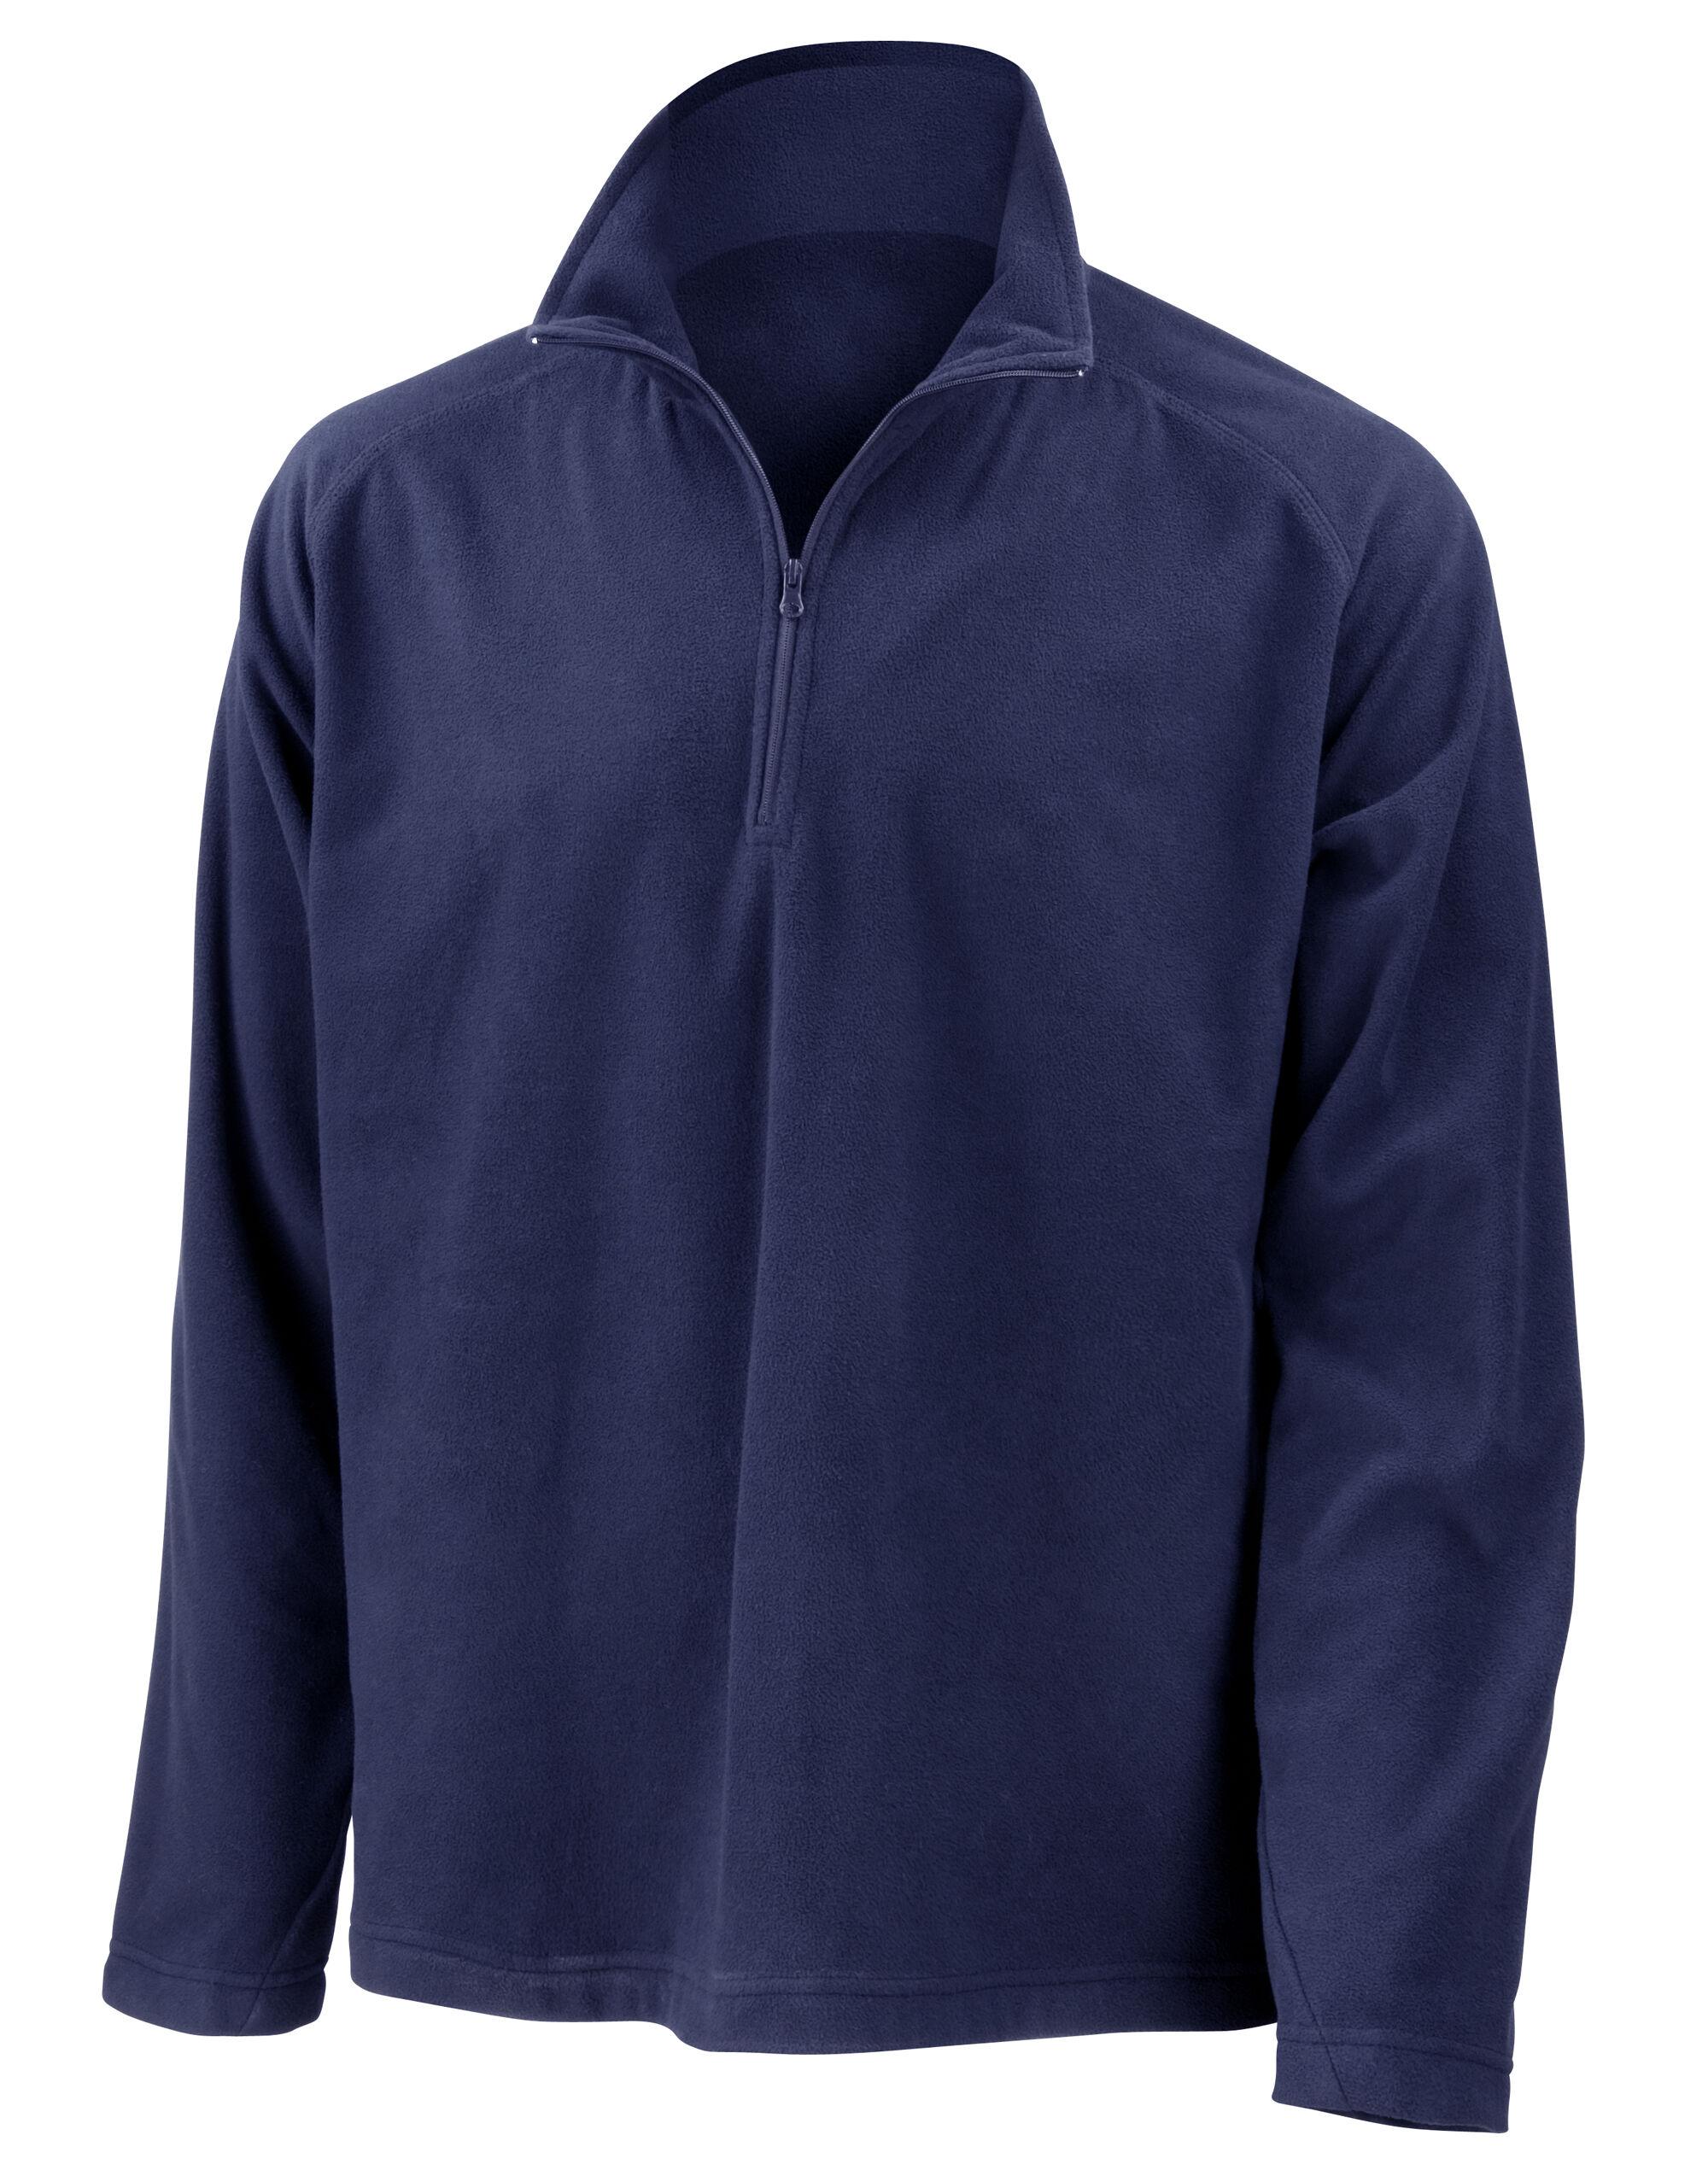 Core Micron Fleece